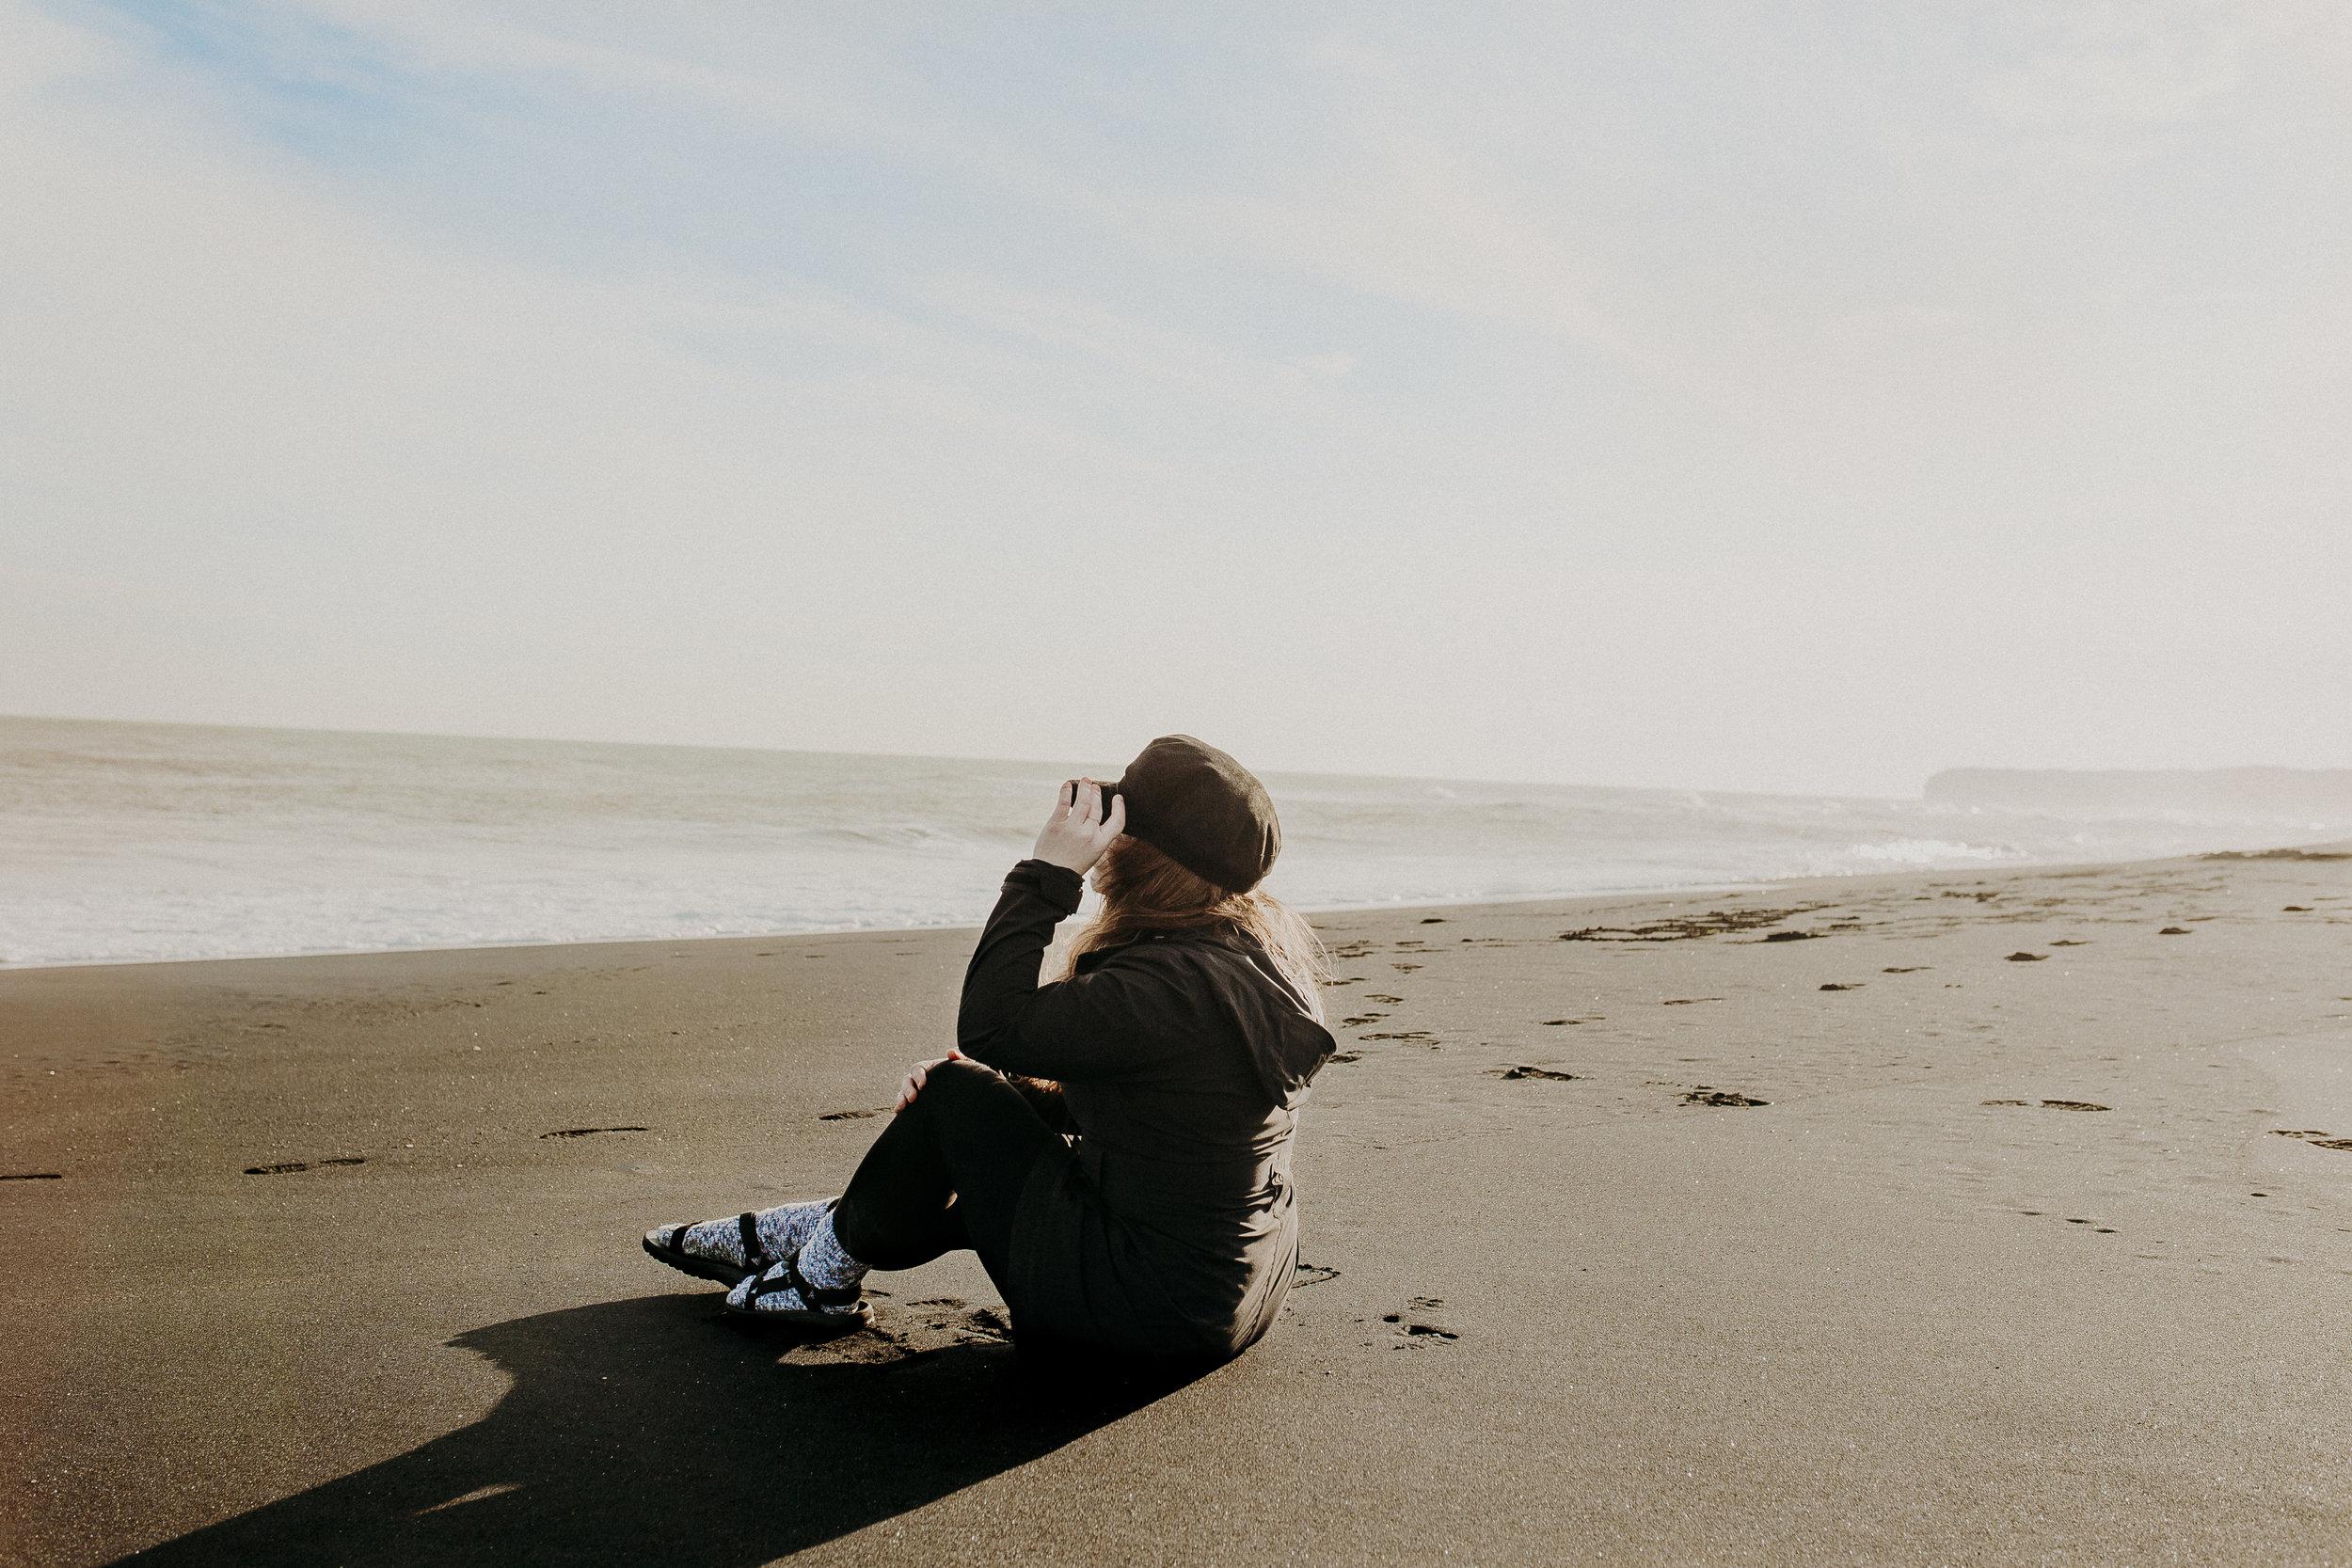 new-zealand-black-sand-beaches-north-island-7.jpg